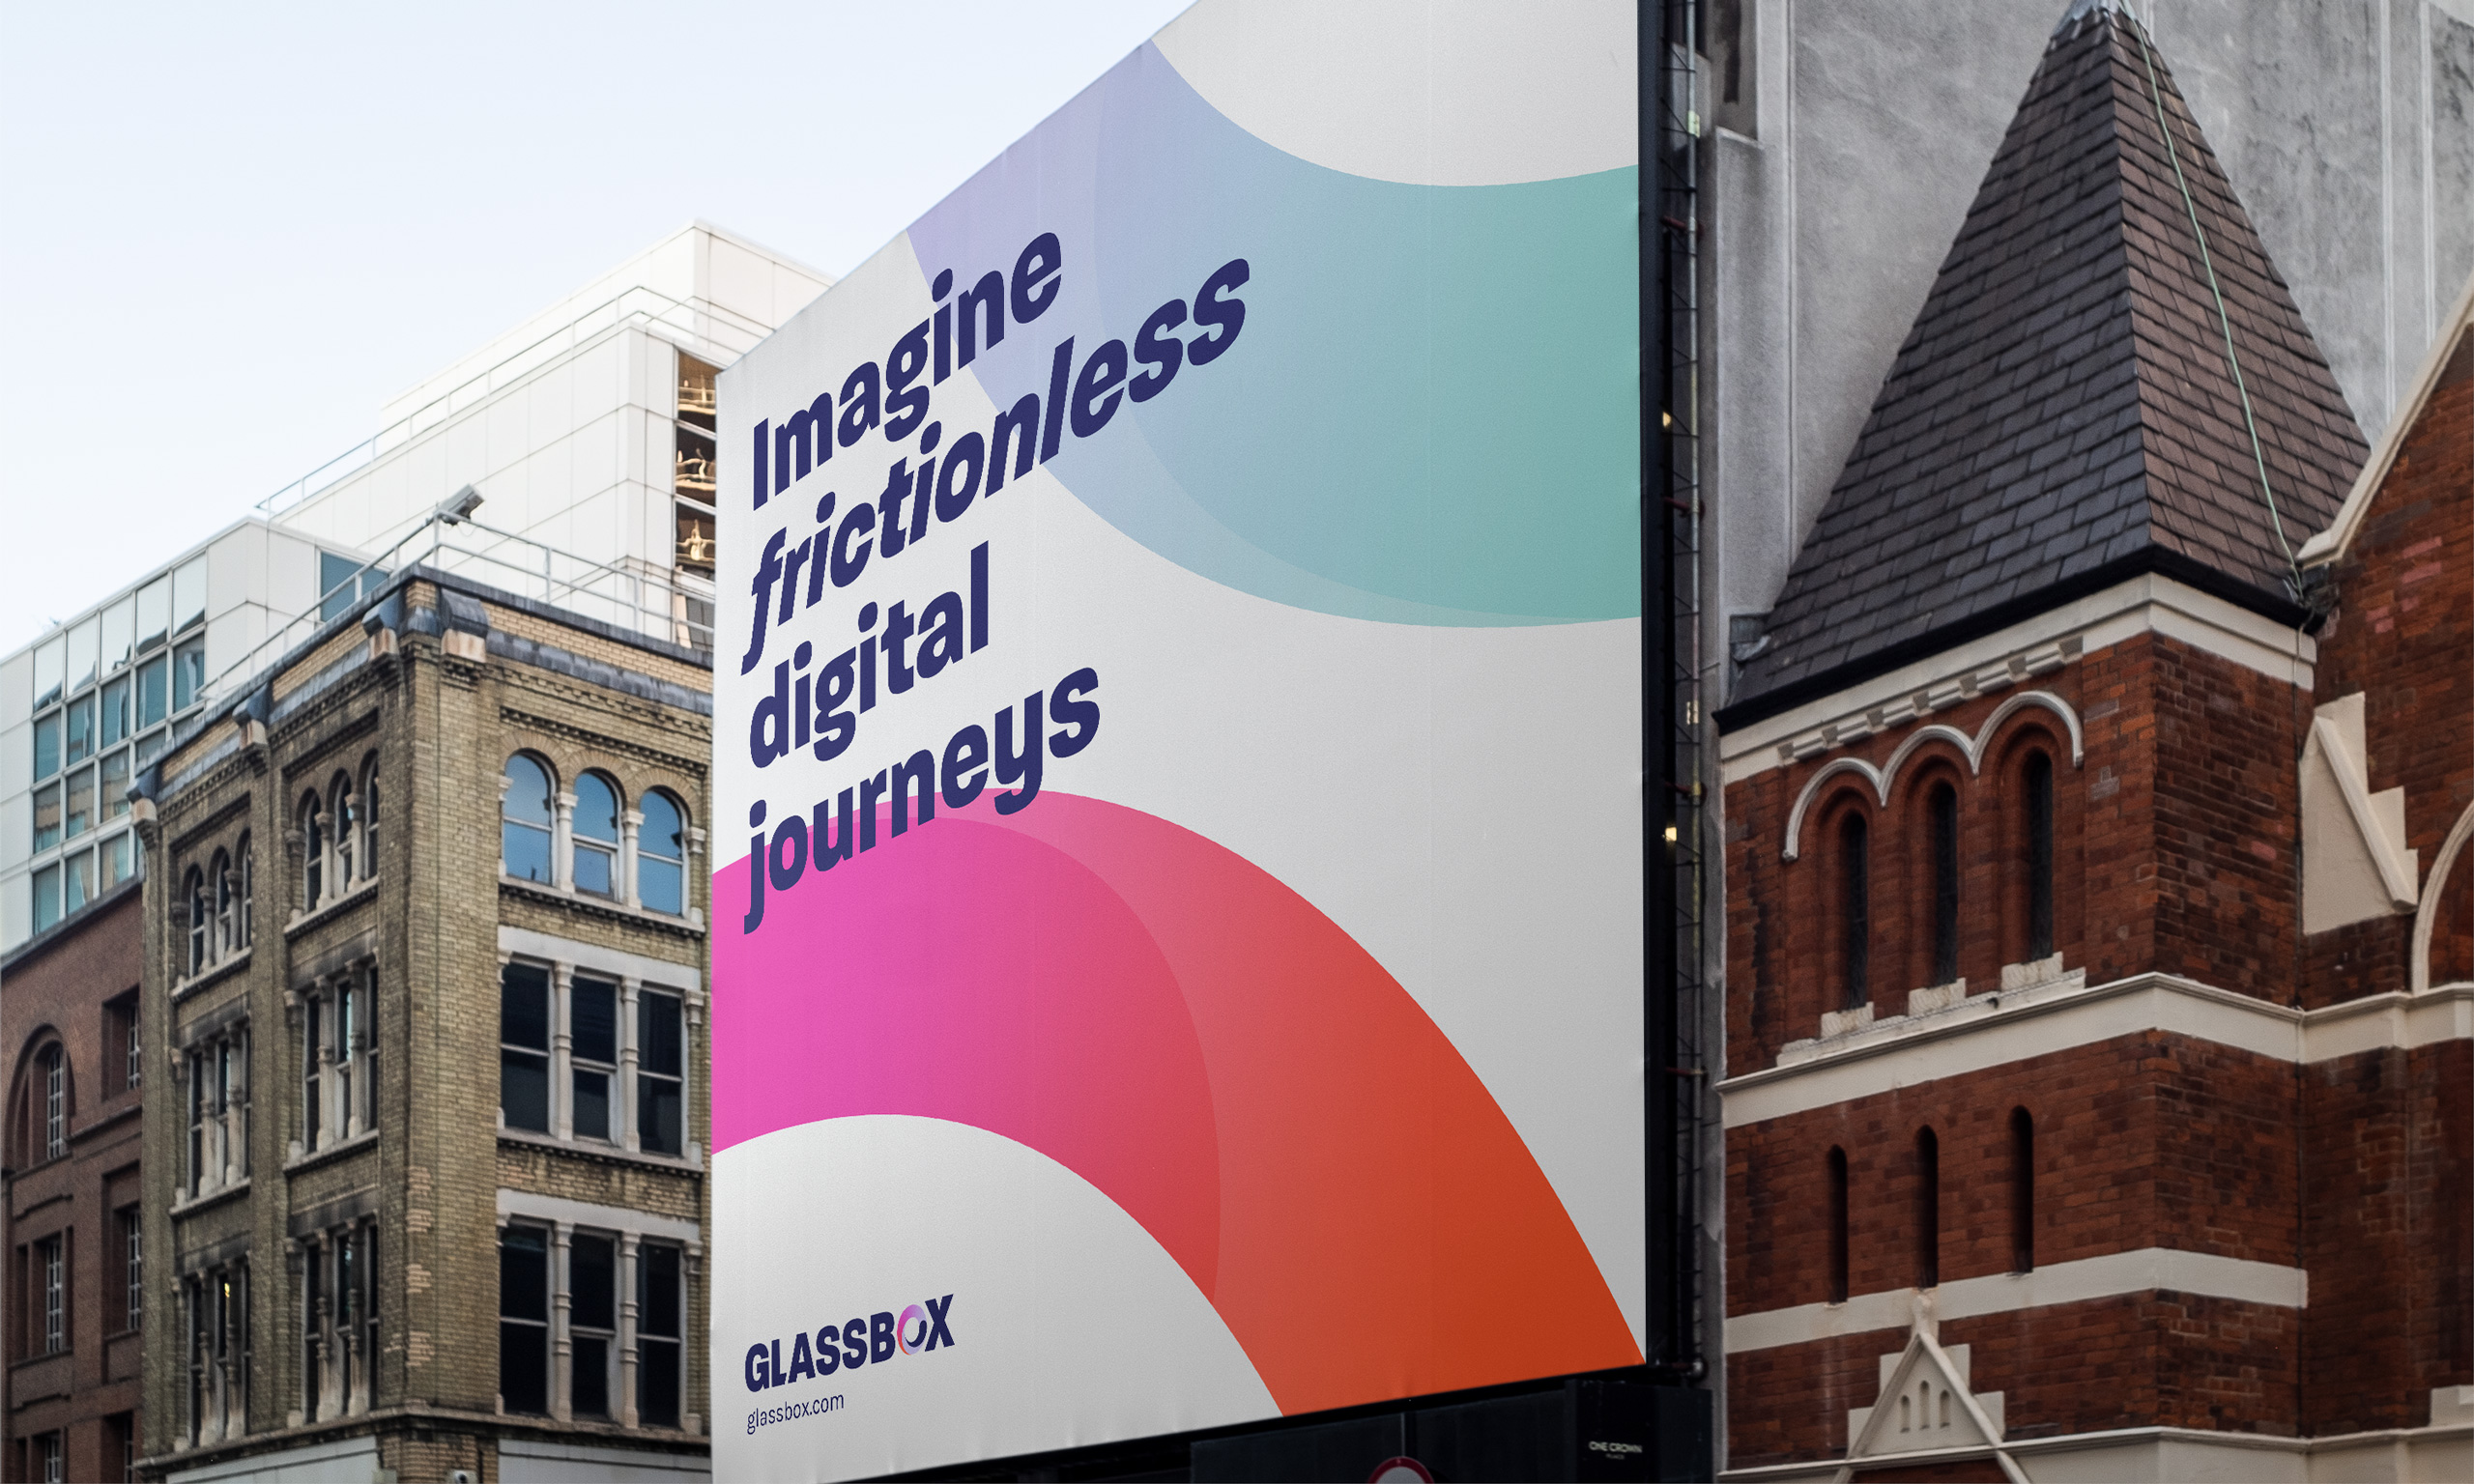 Giant billboard banner in city